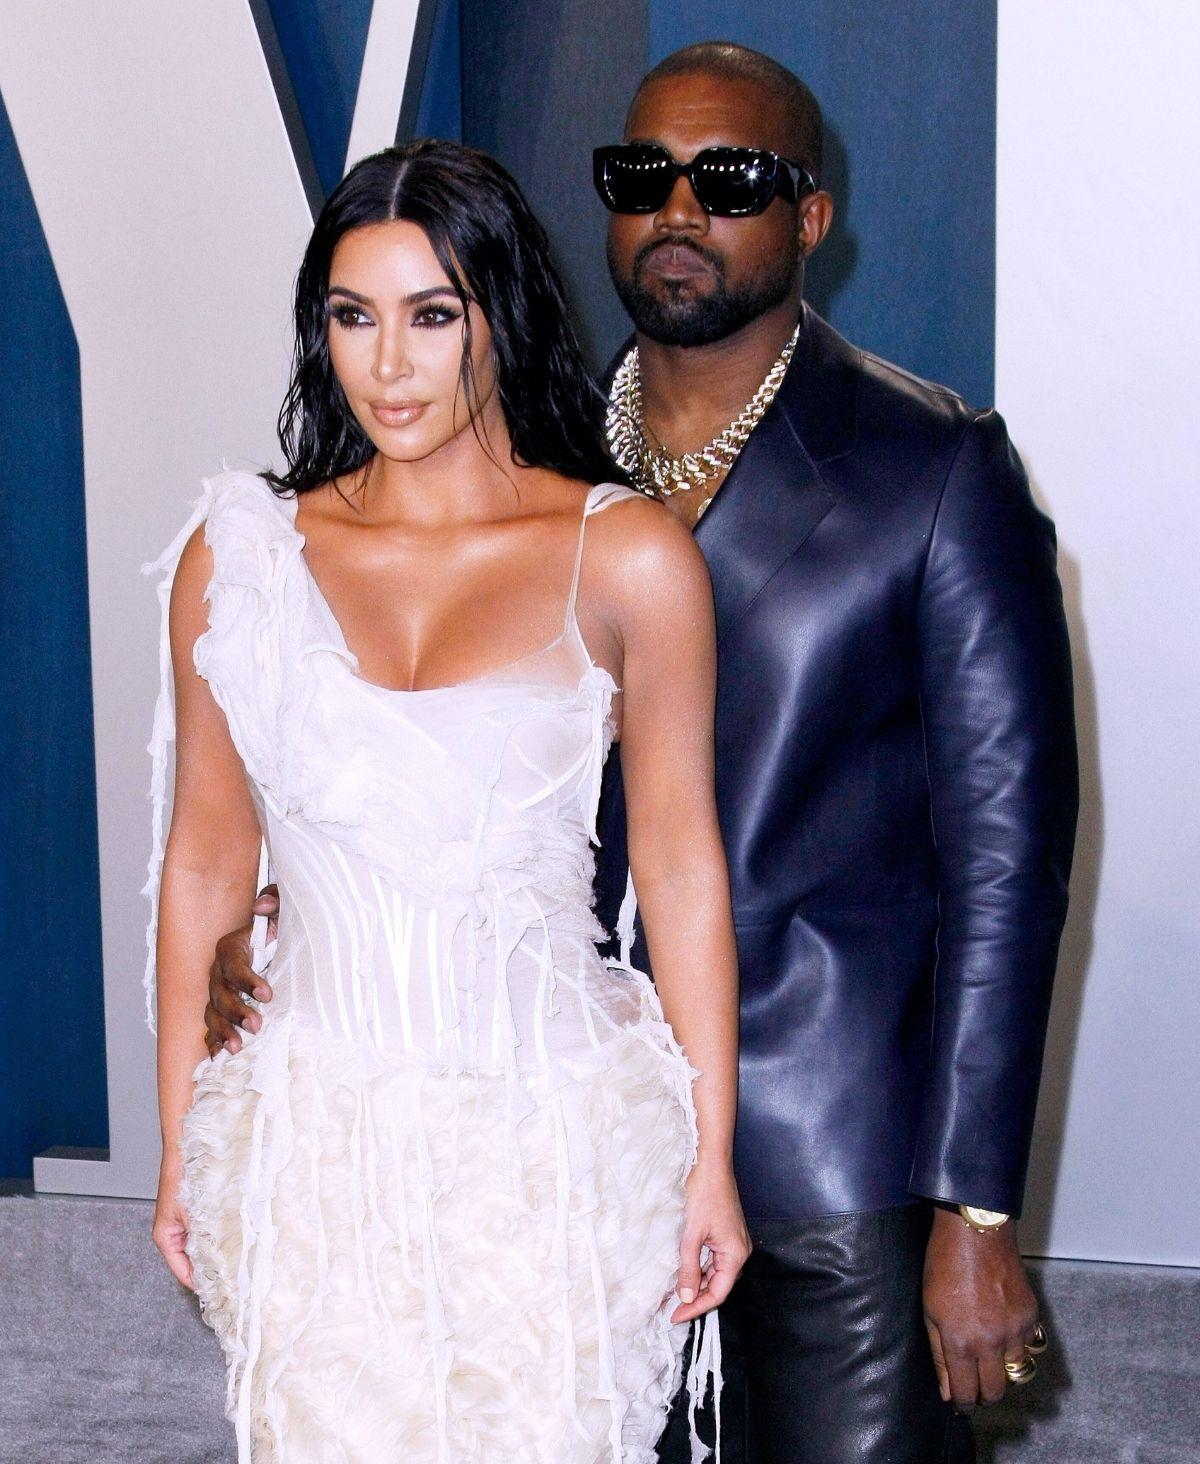 Affäre?! Kanye West entfolgt Kim Kardashian auf Instagram